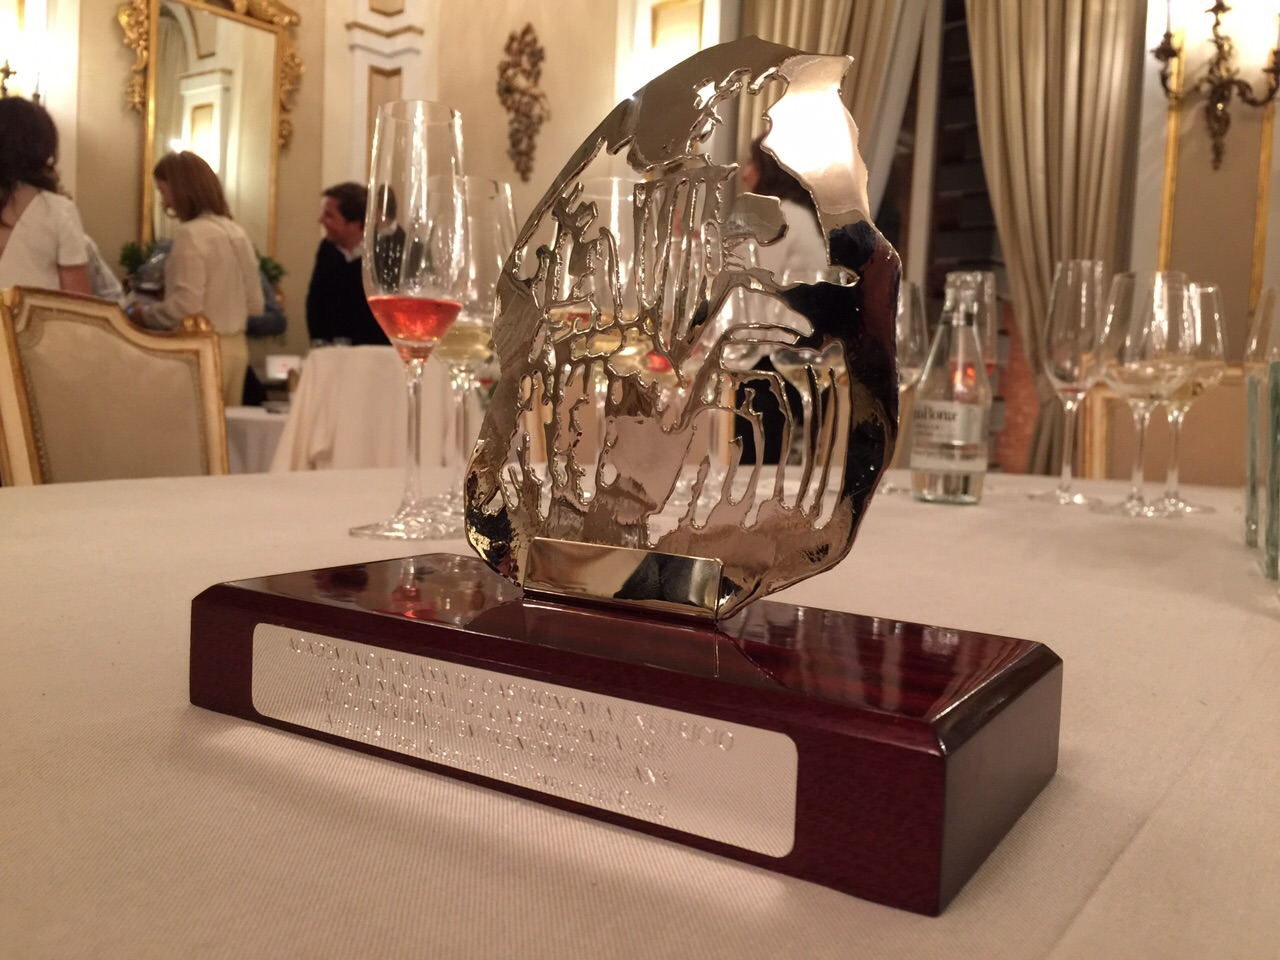 Premio al #MejorCocineroJoven2014 para Antonio Simôes